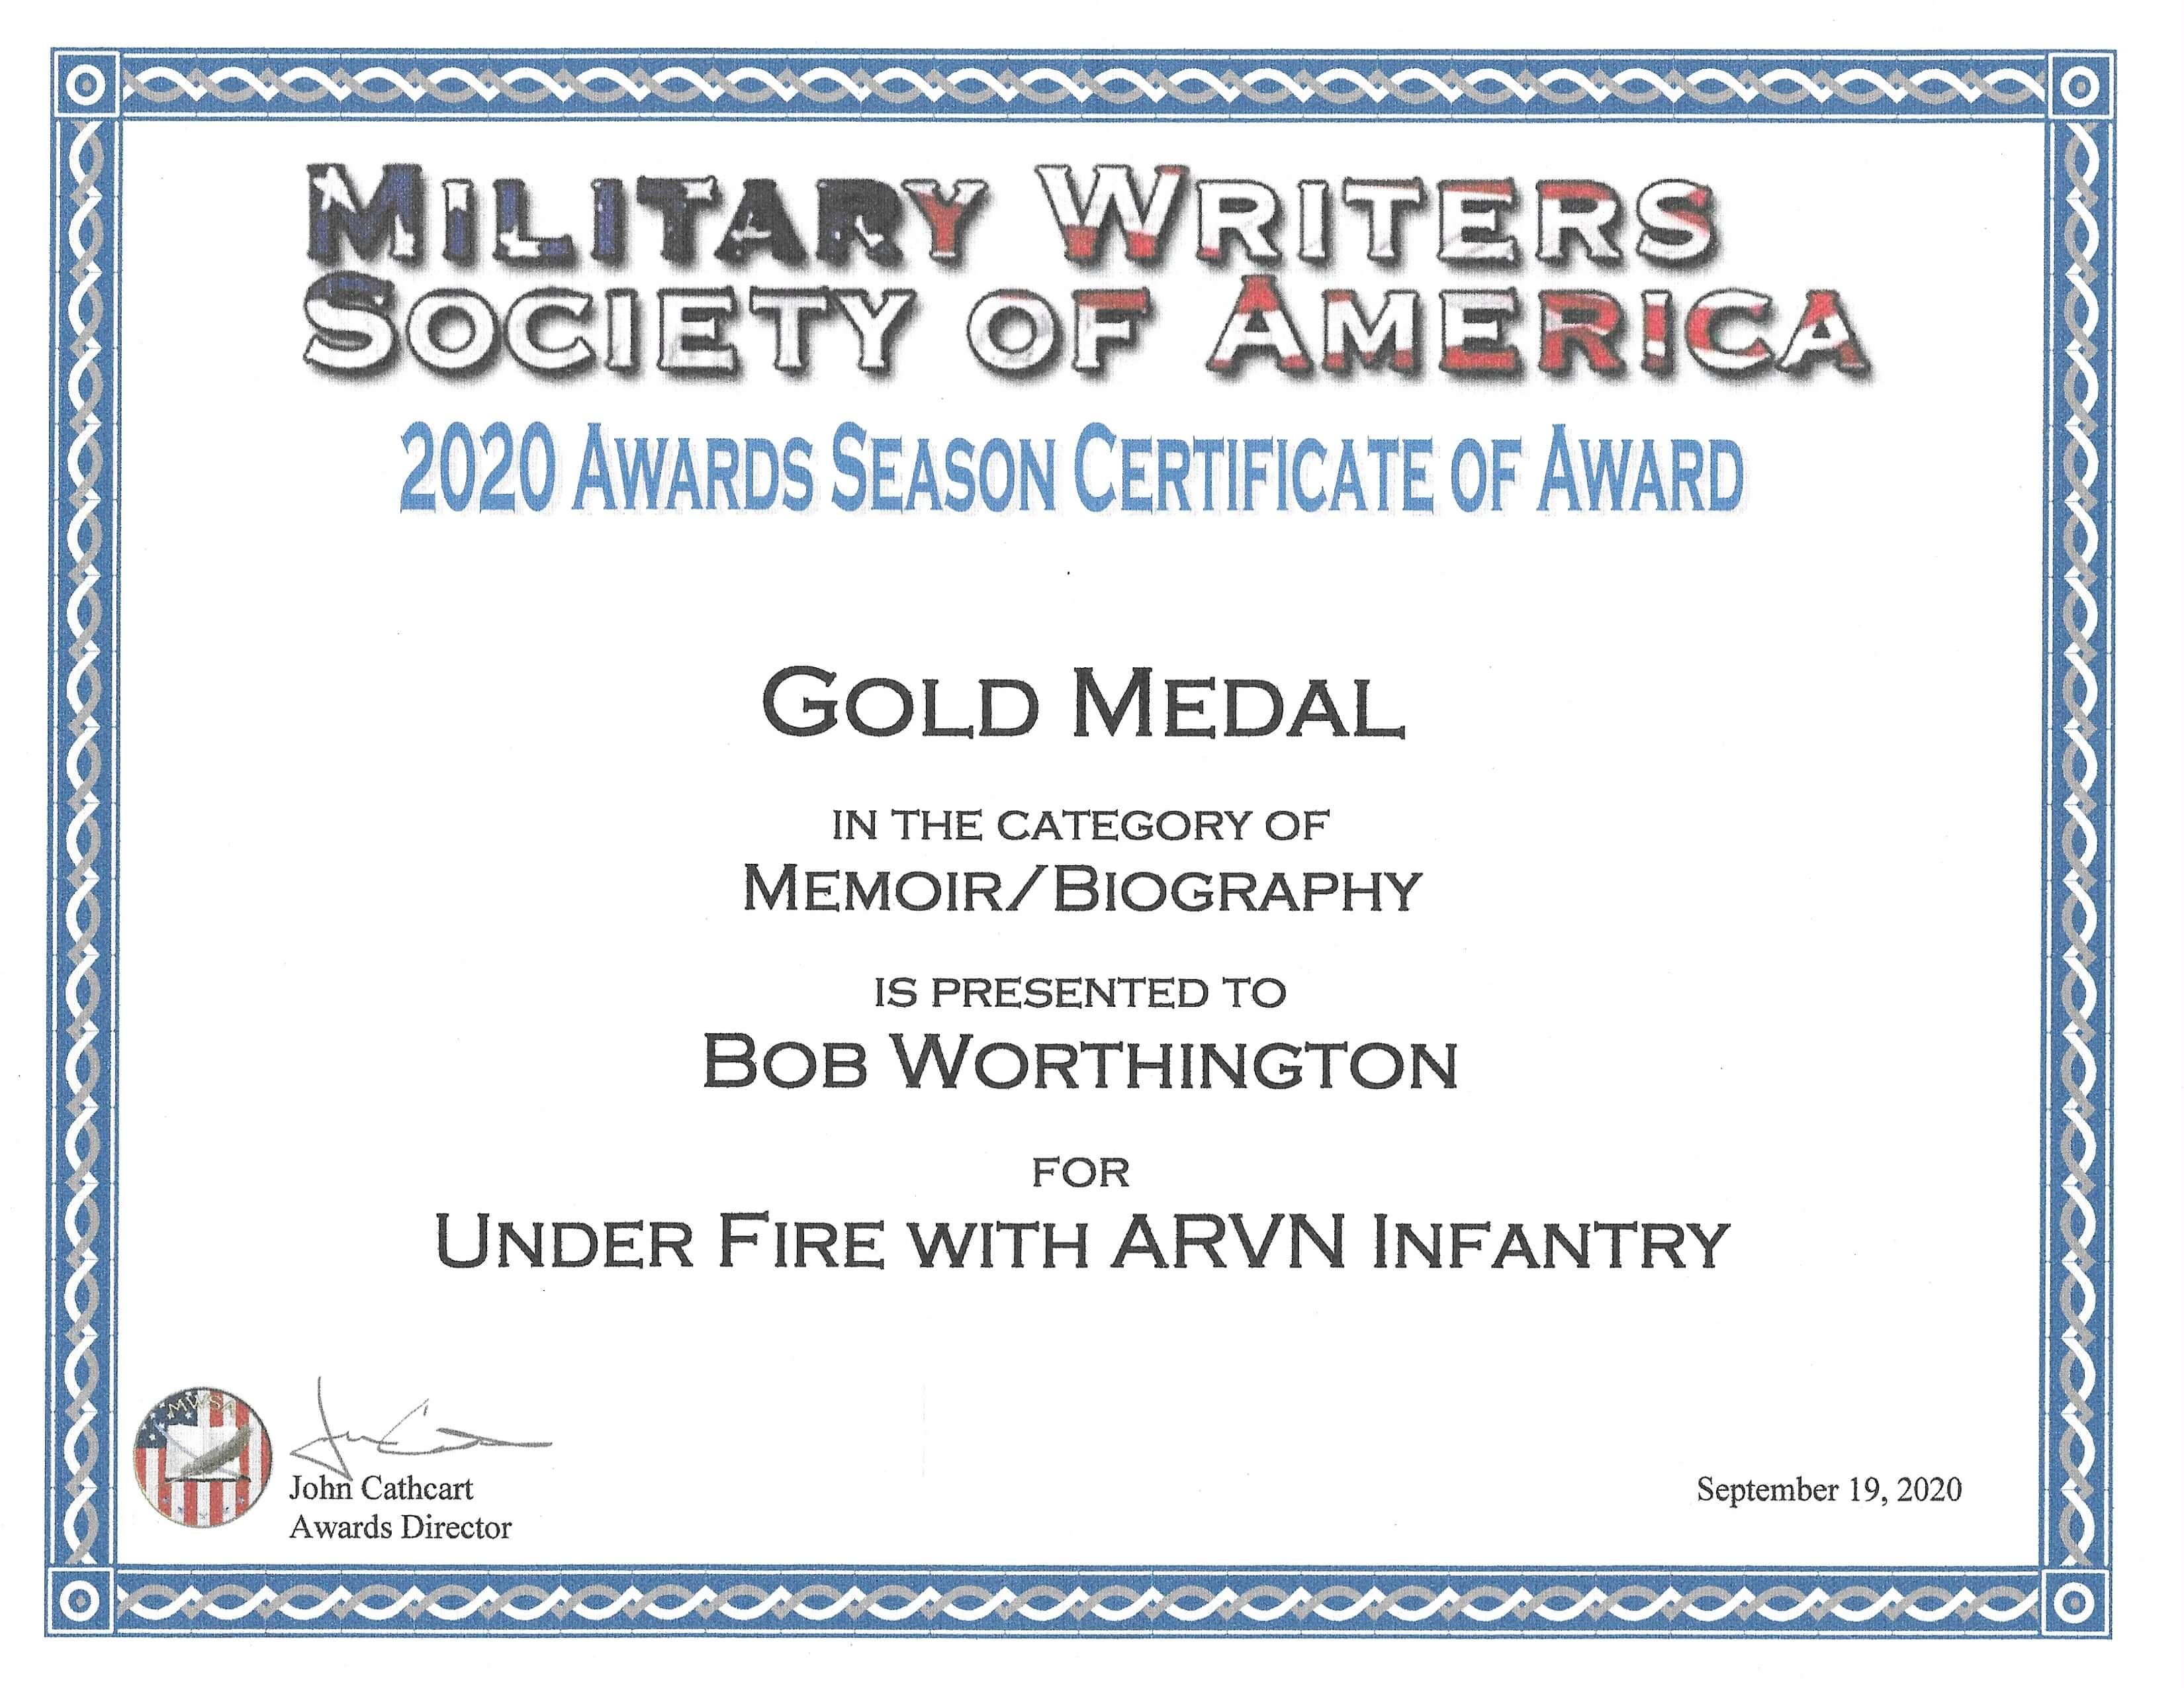 MSWA award certificate 2020